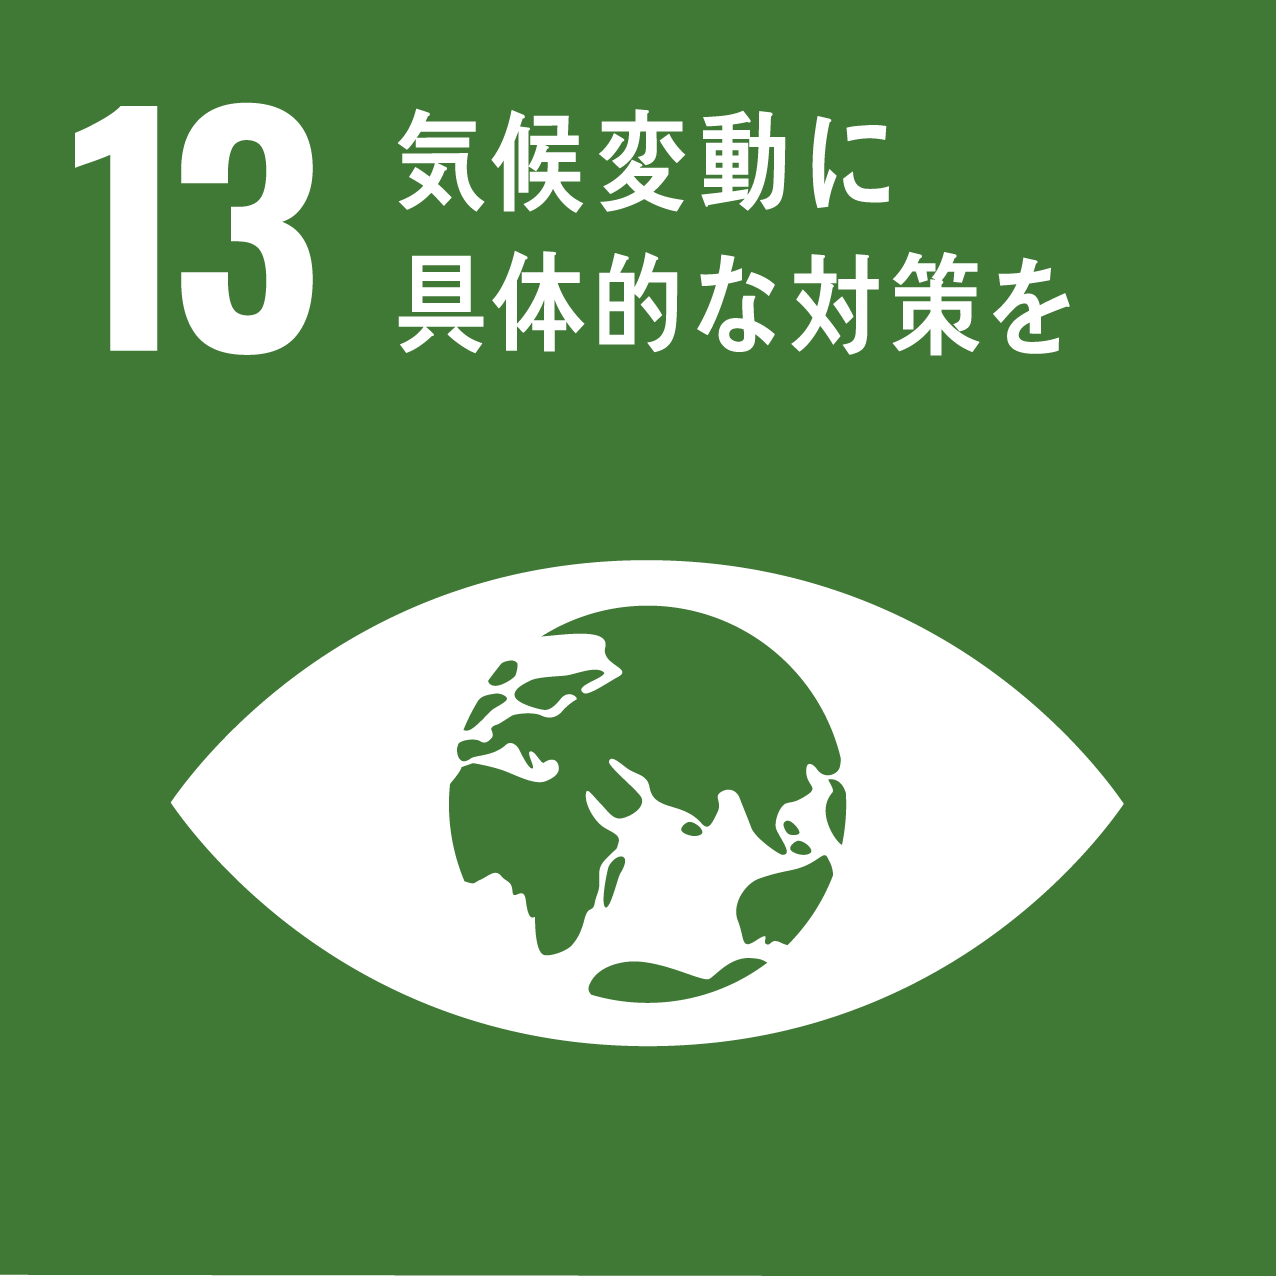 SDGs 13.気候変動に具体的な対策を